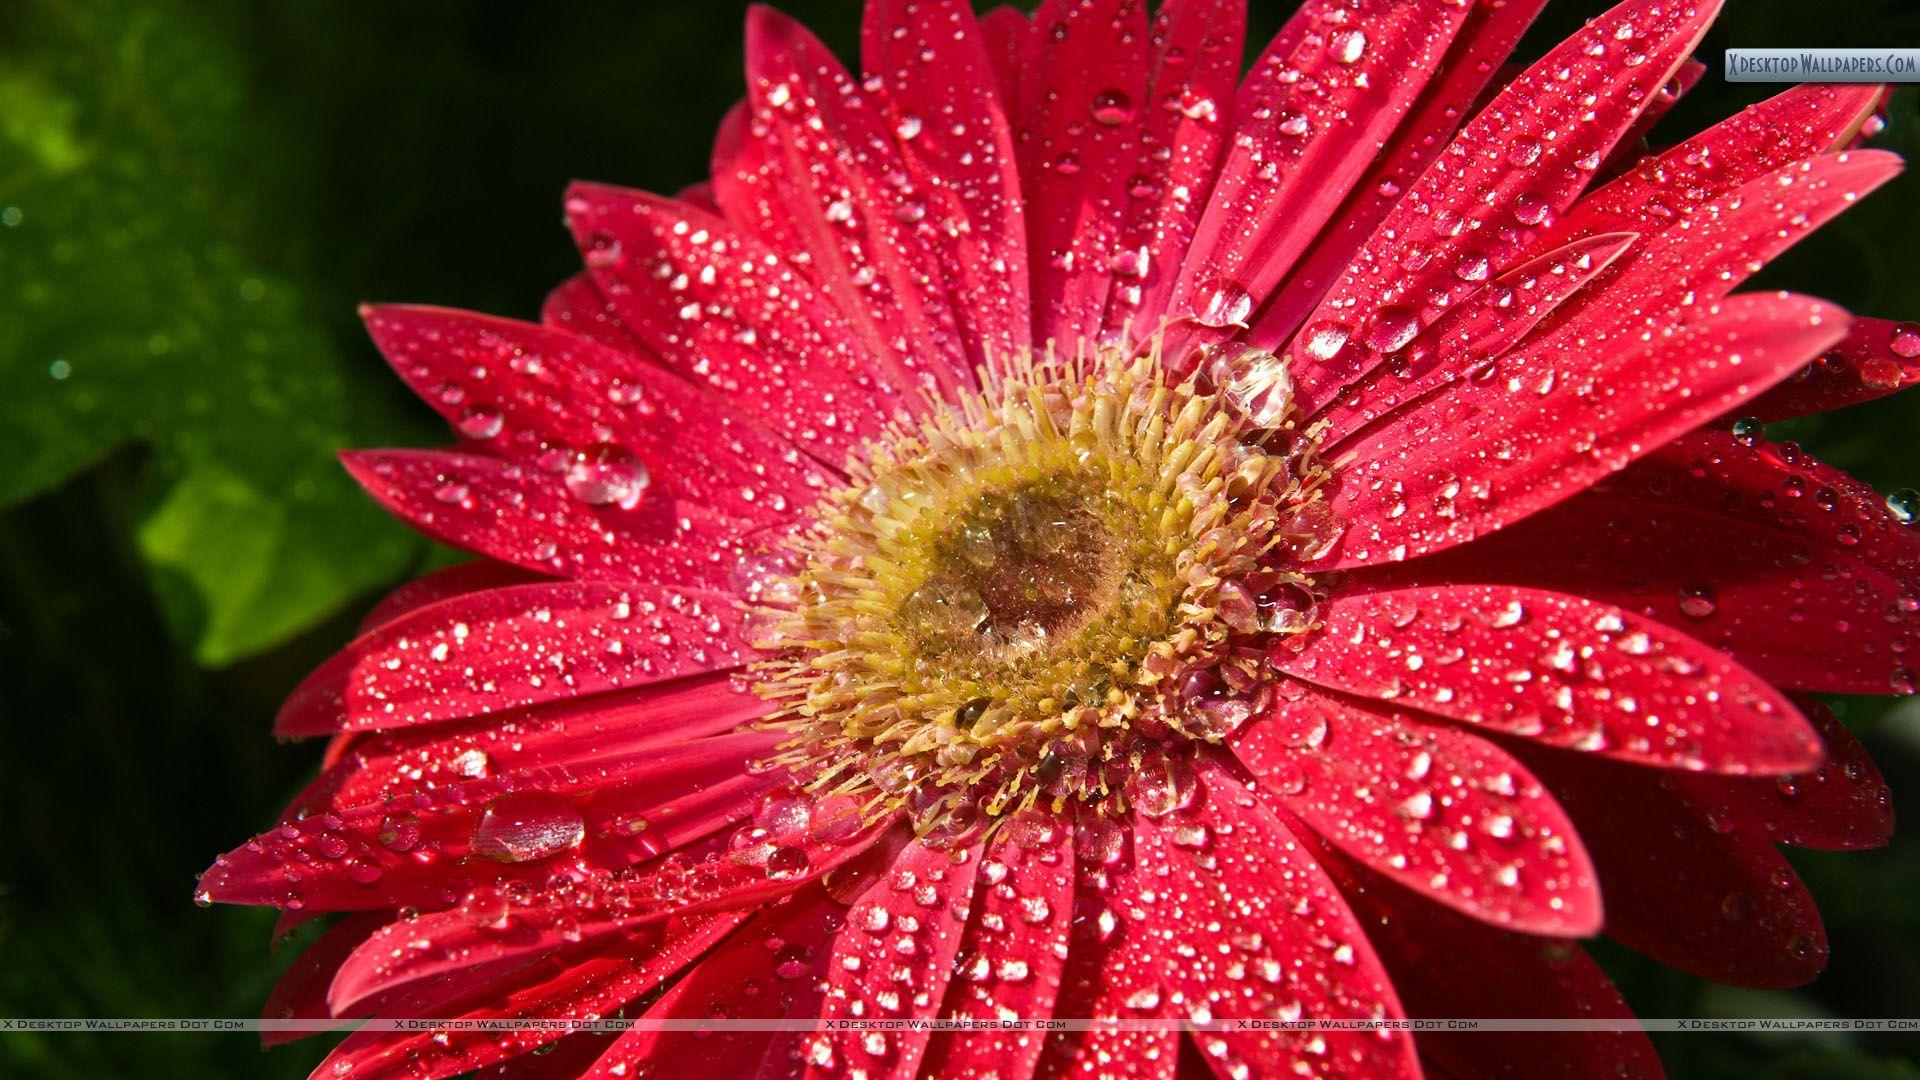 Water Drops Red Sunflower Red Sunflowers Pink Sunflowers Gerbera Flower